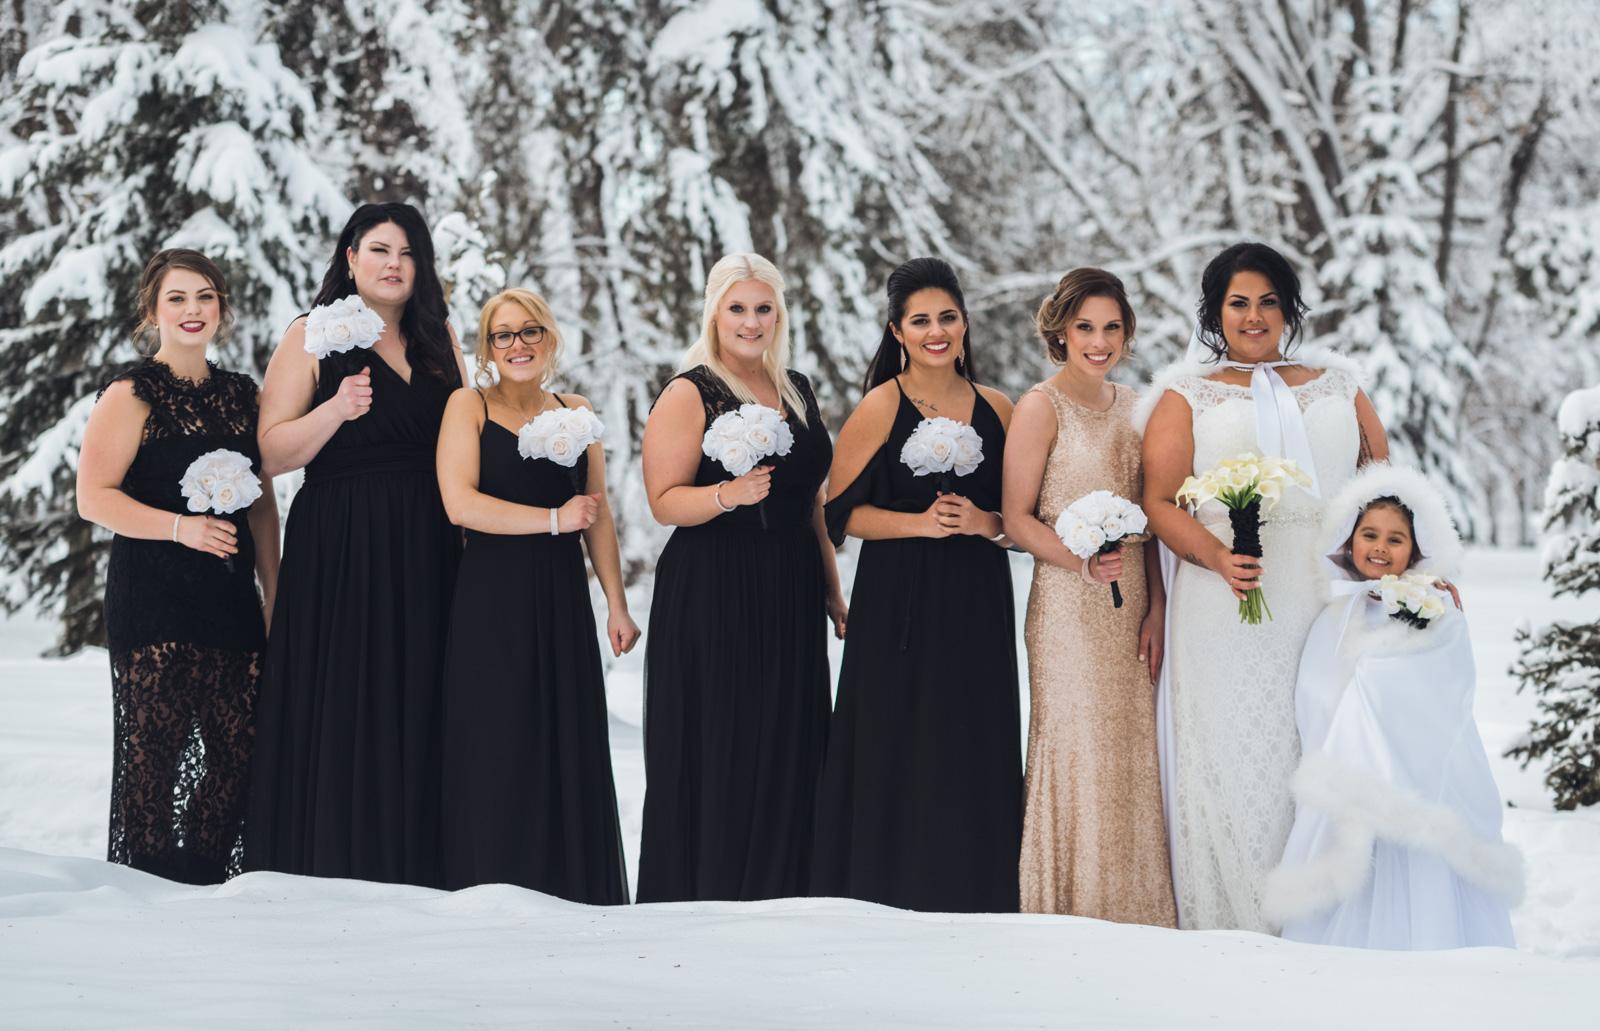 rheana-chris-wedding-blog-162.jpg